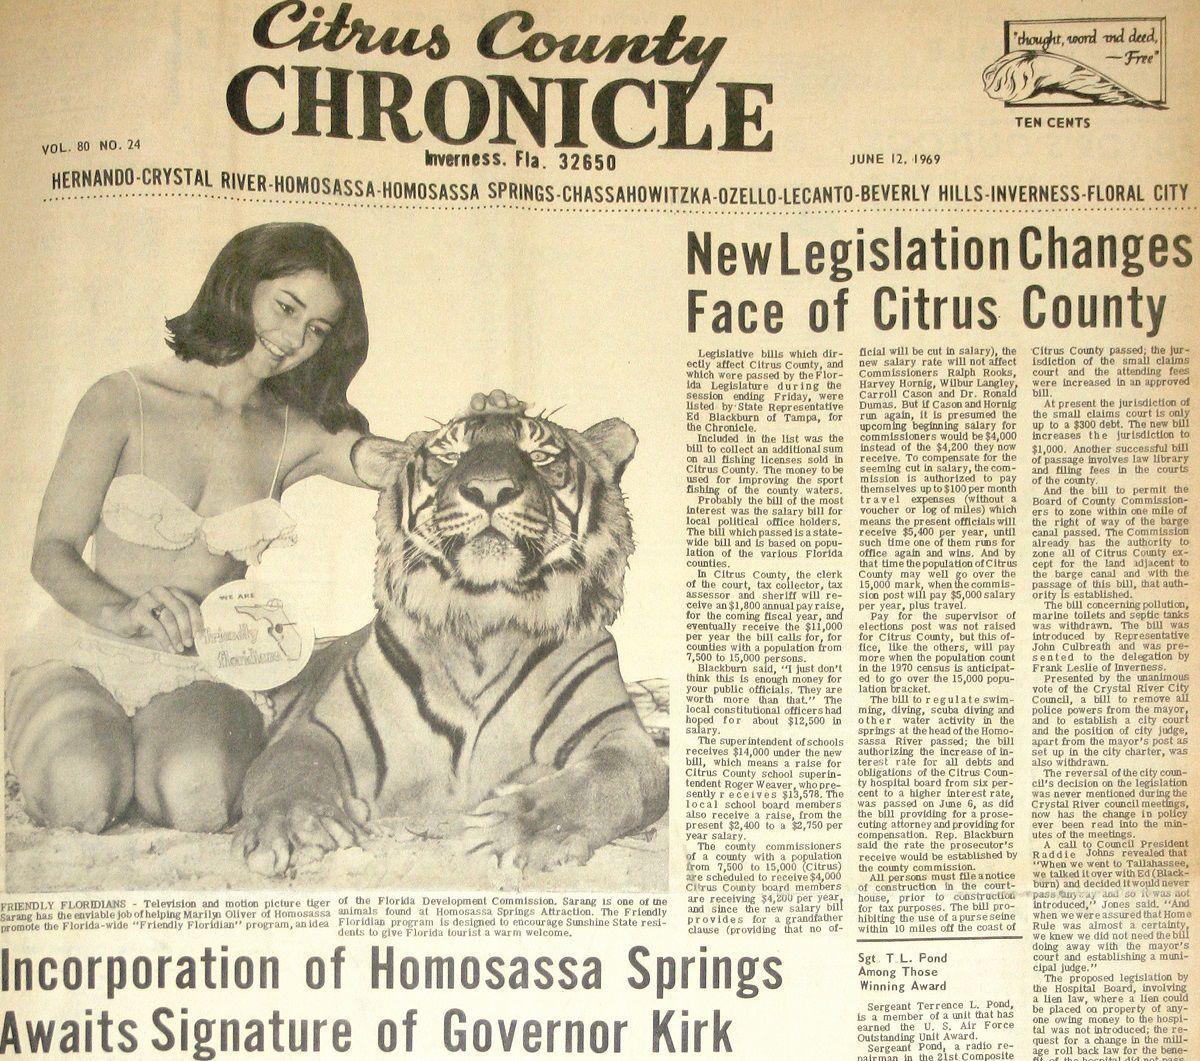 Citrus County Chronicle June 12, 1969